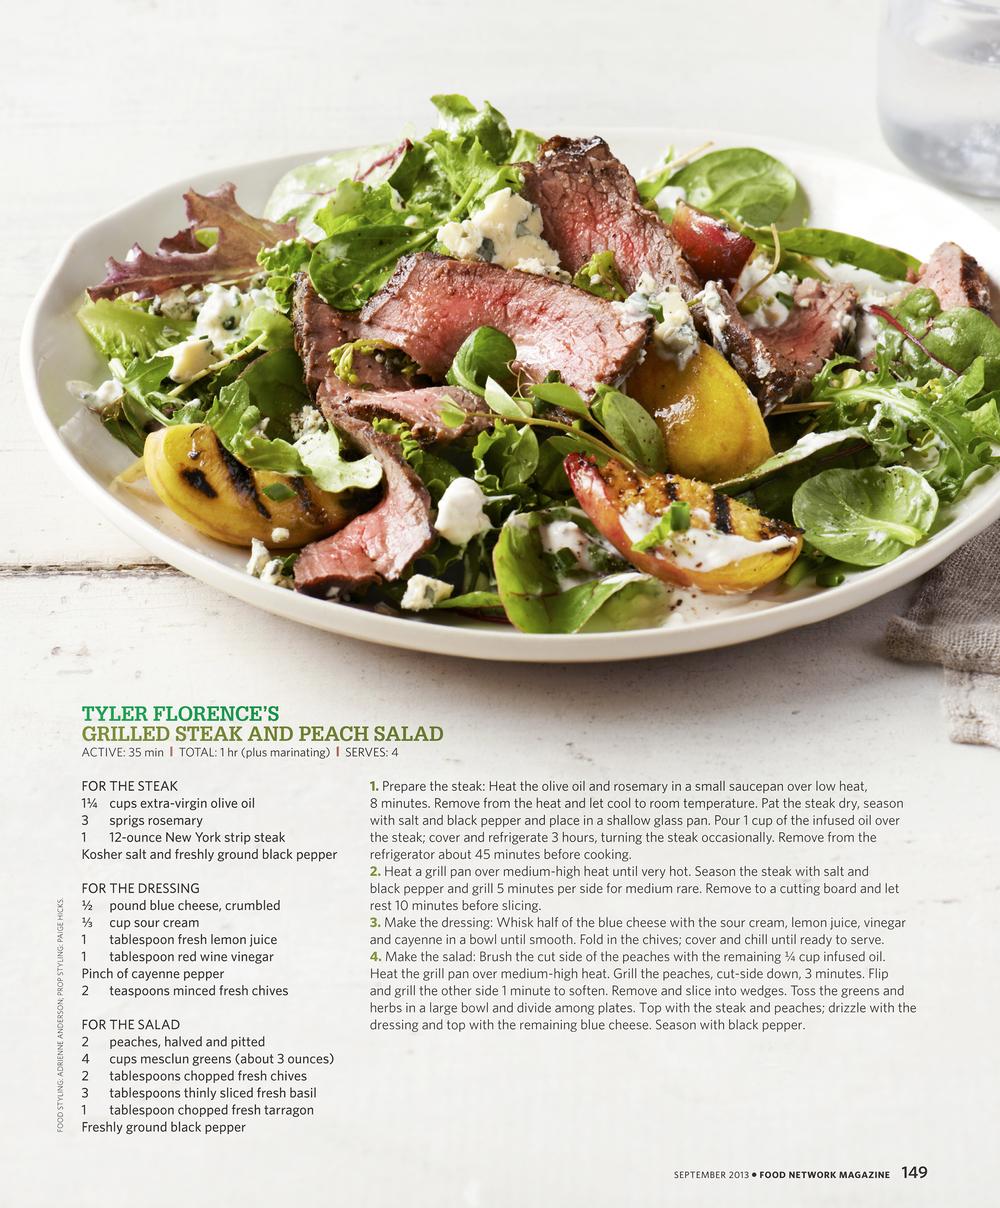 Sept 2013 Salads 2.jpg